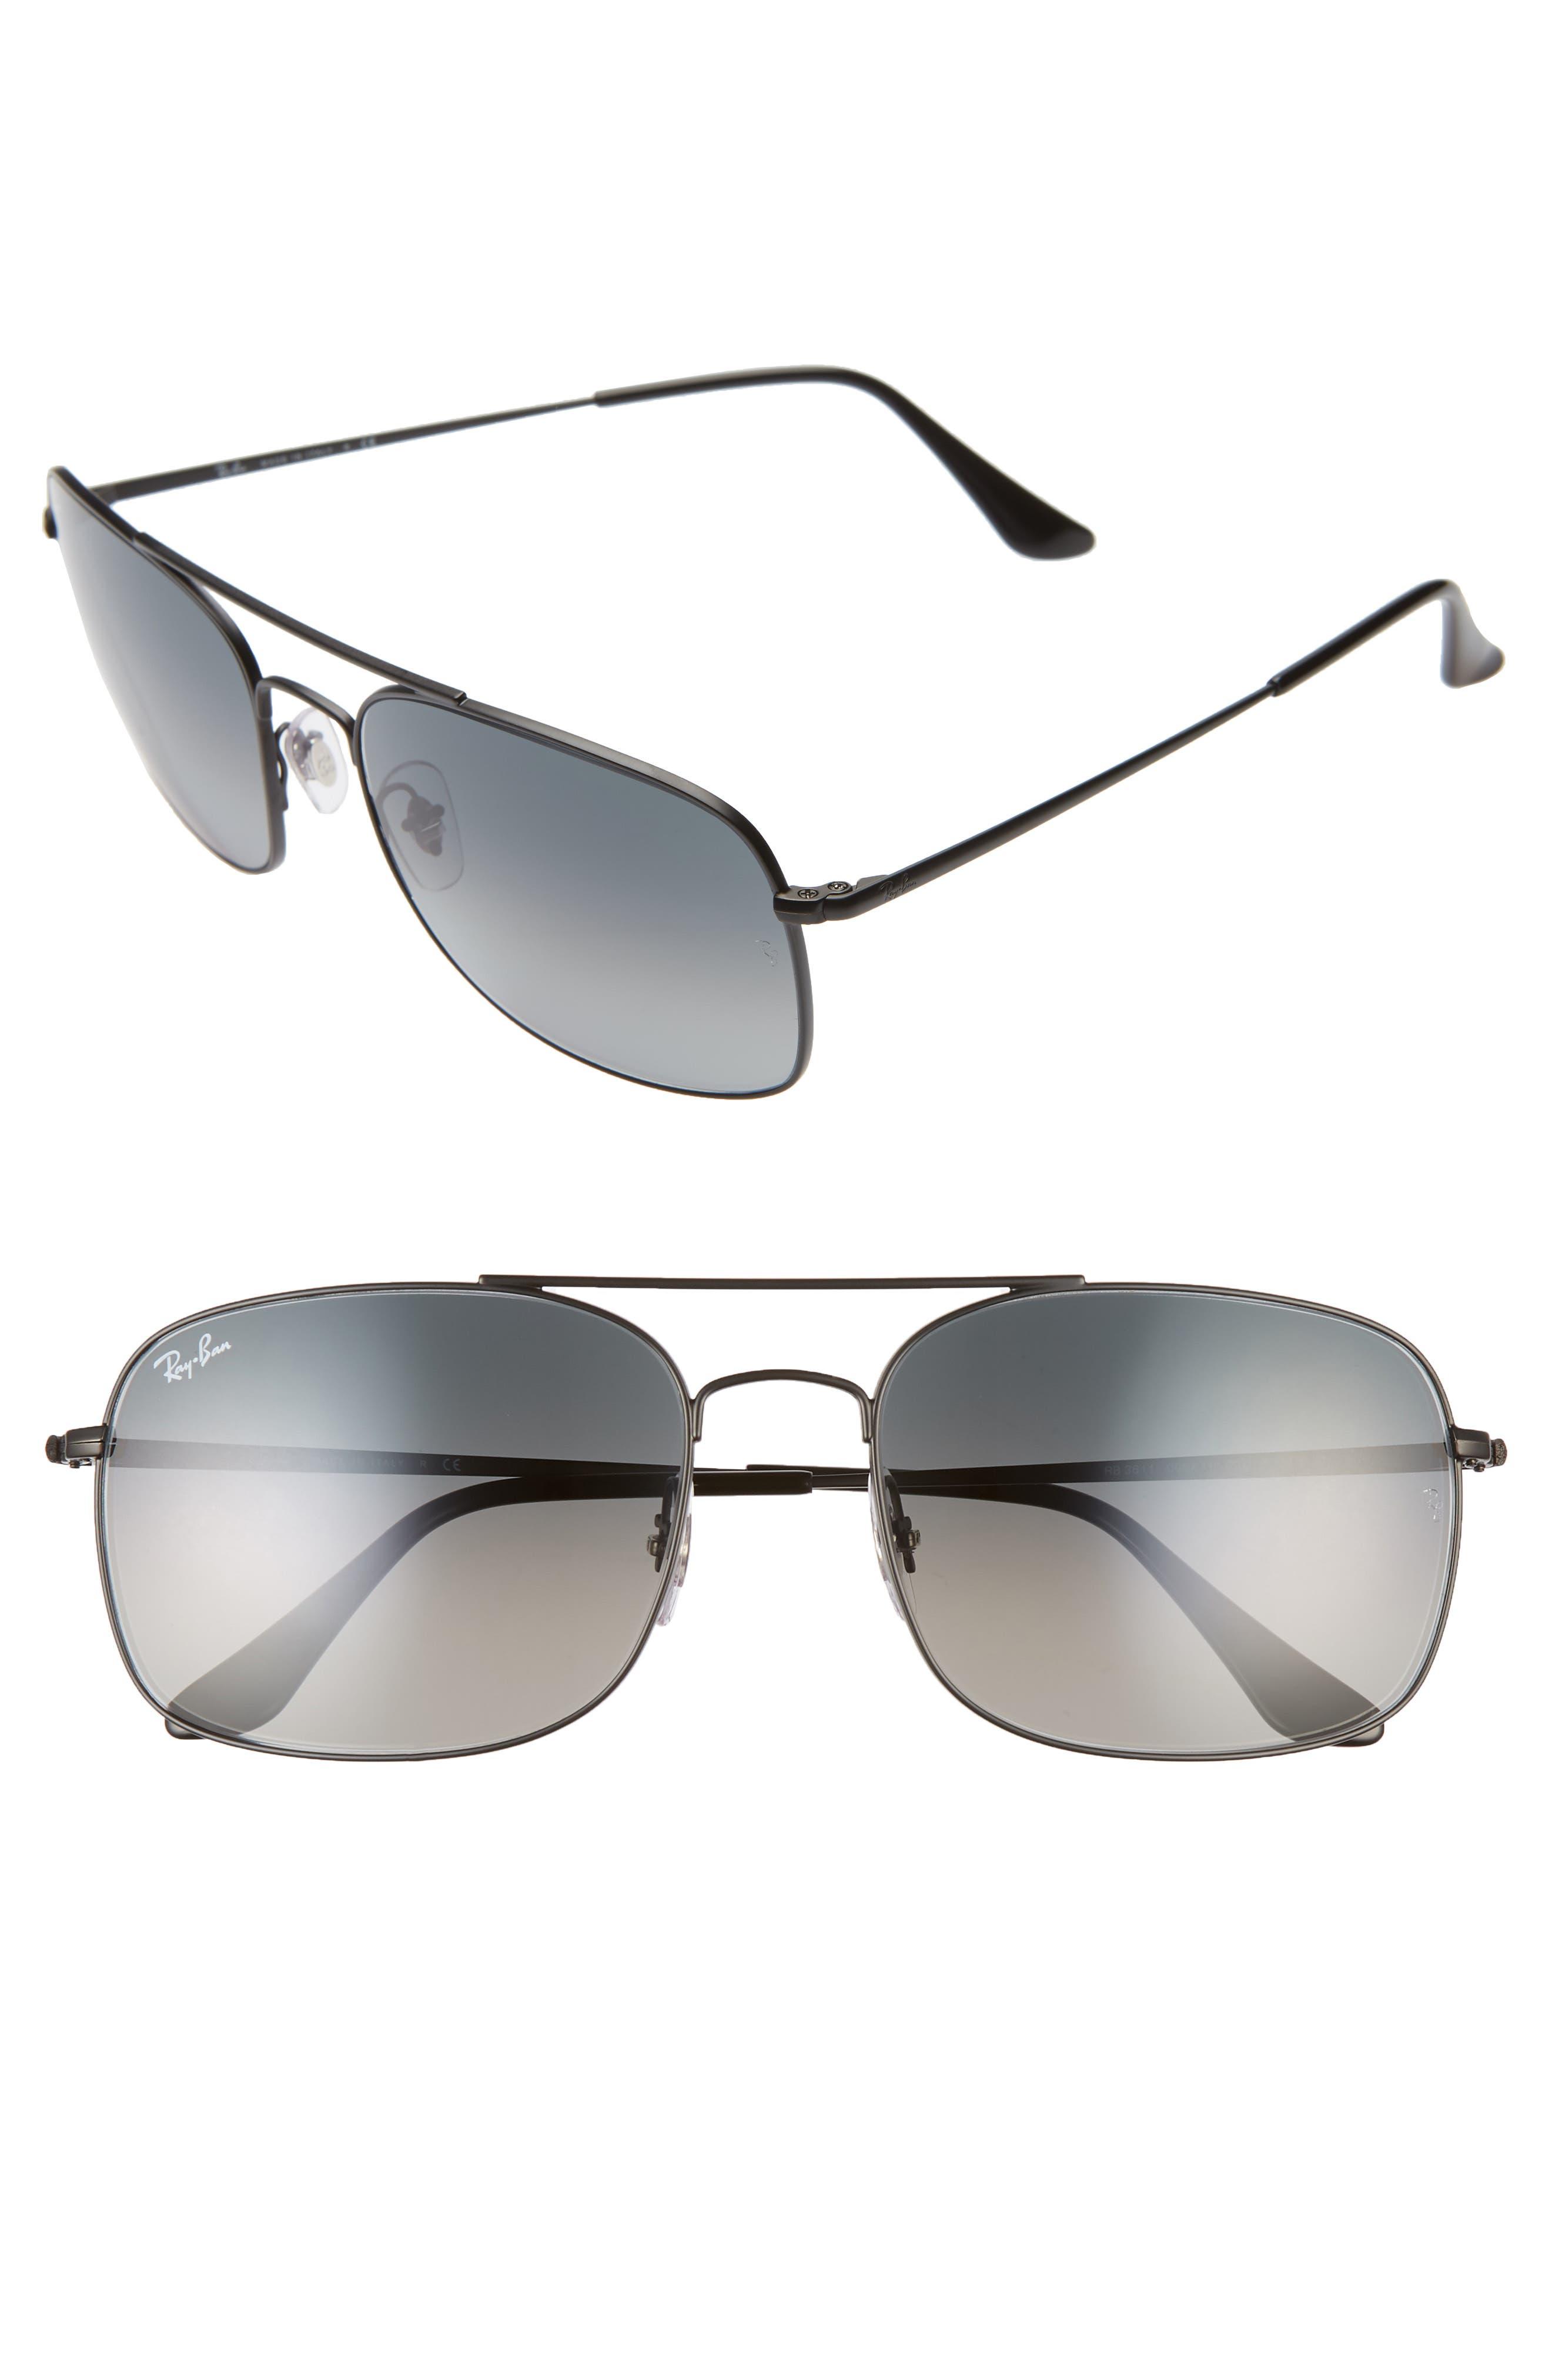 Ray-Ban 60Mm Aviator Sunglasses - Matte Black/ Black Gradient